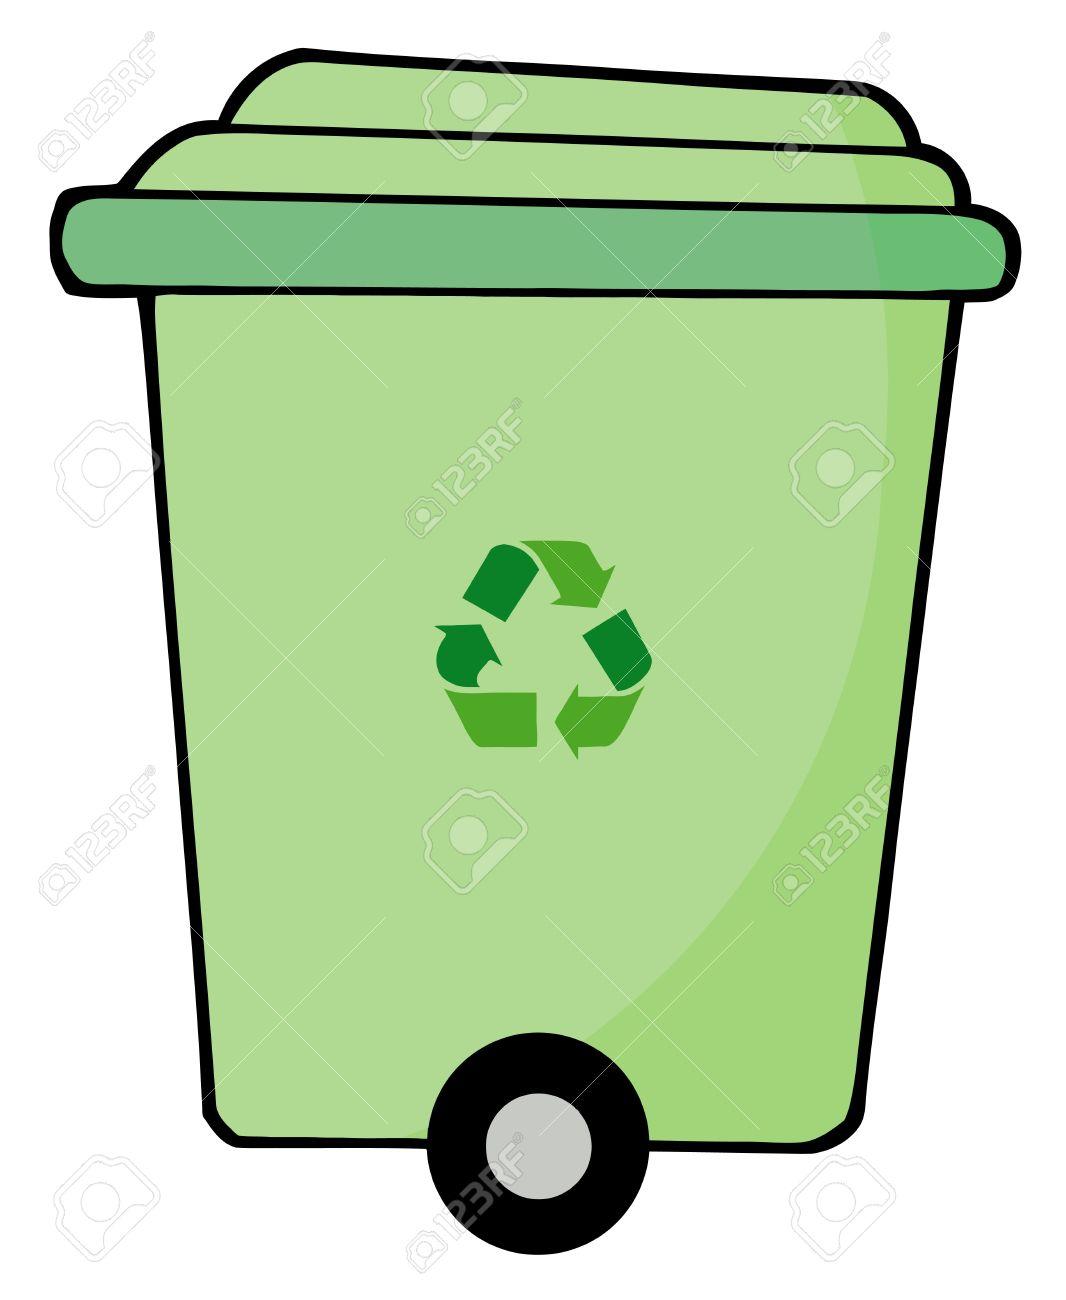 1066x1300 Green Clipart Recycle Bin